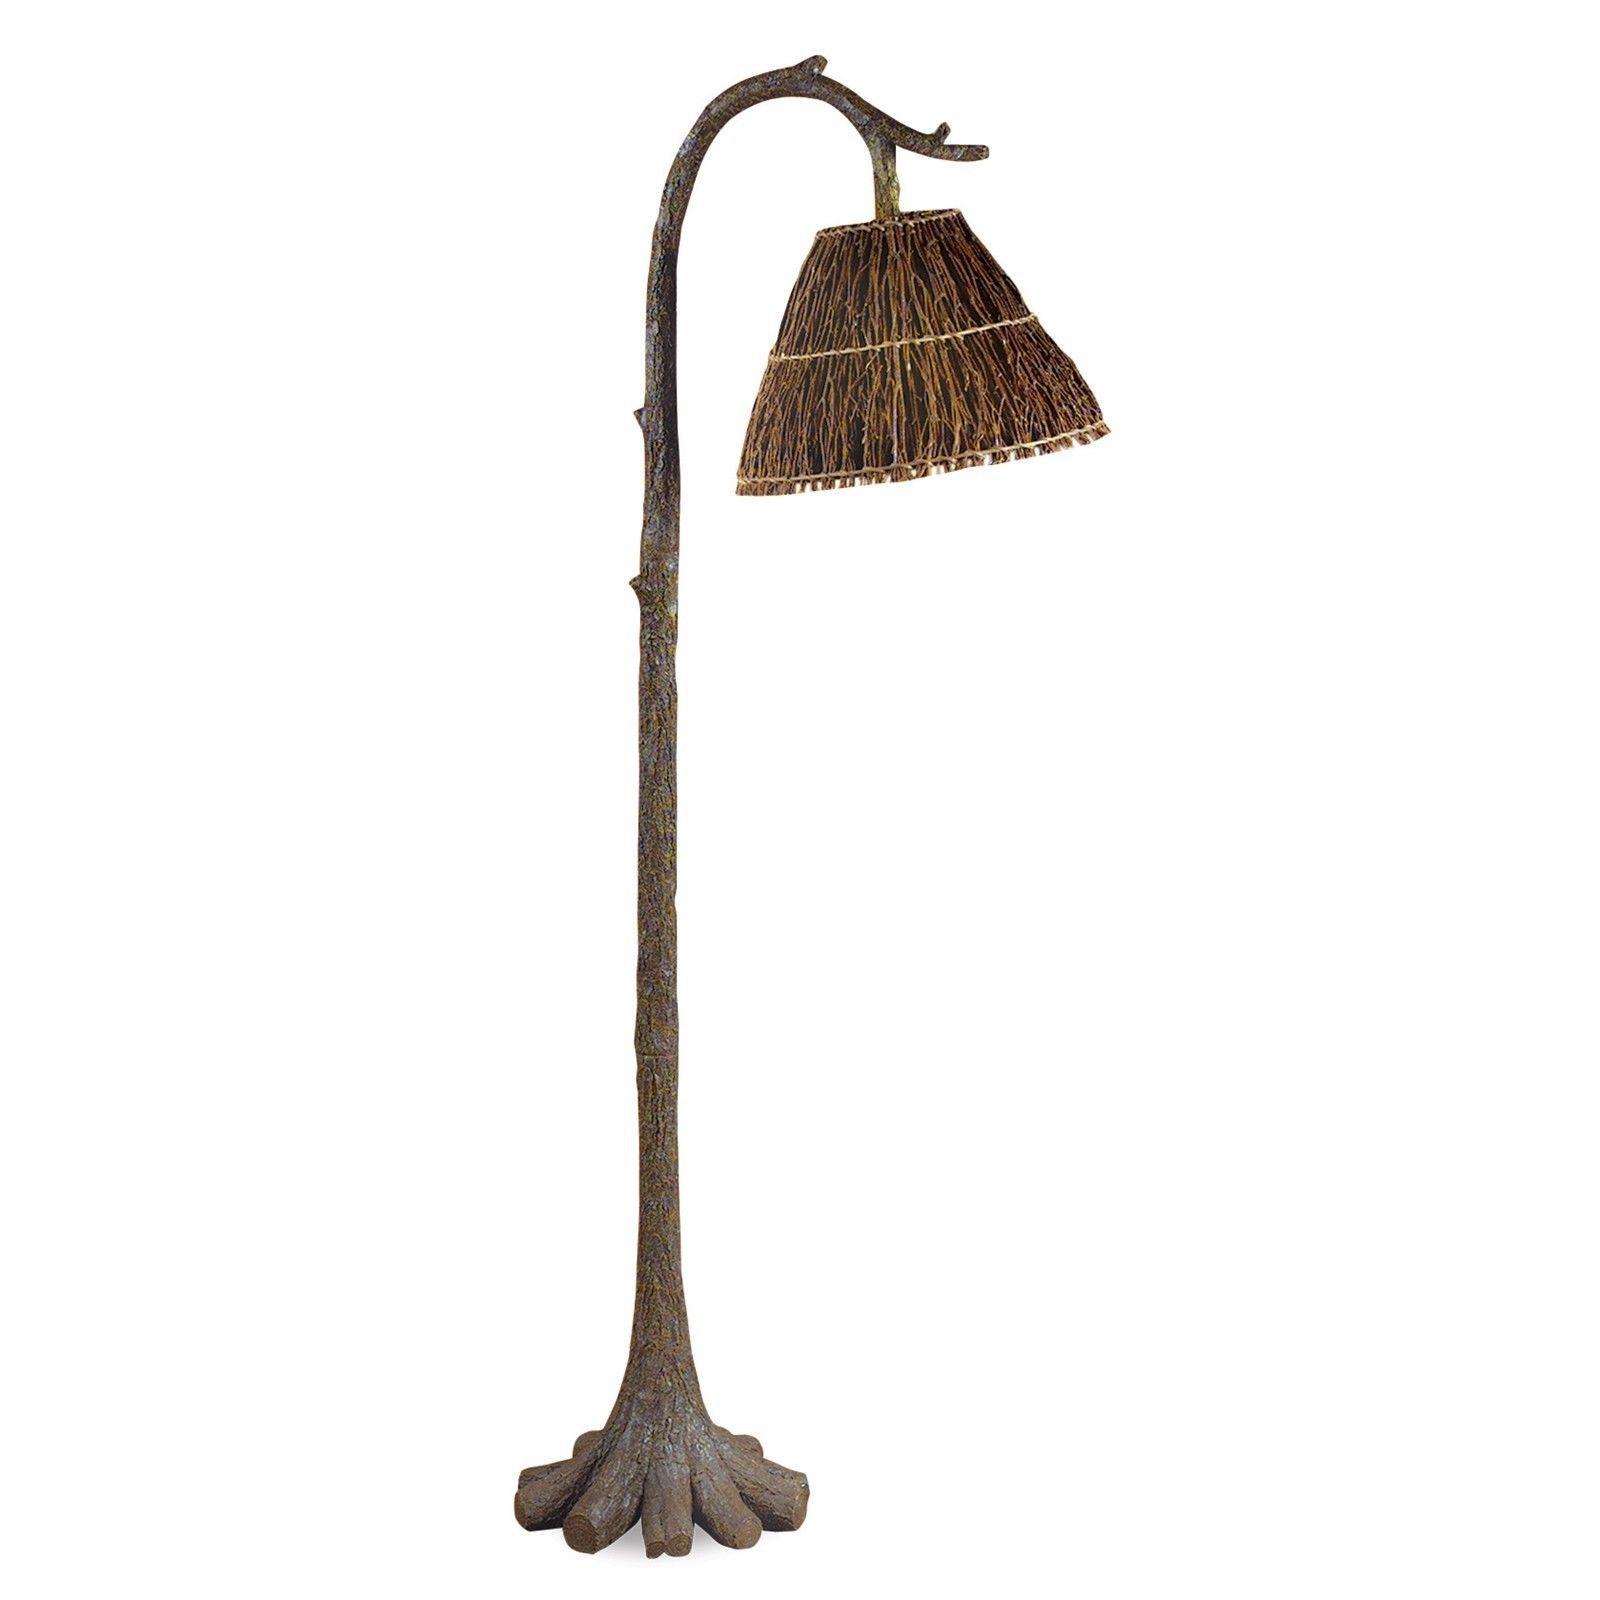 Tree Trunk & Twig Floor Lamp Rustic Cabin Lodge Decor Light